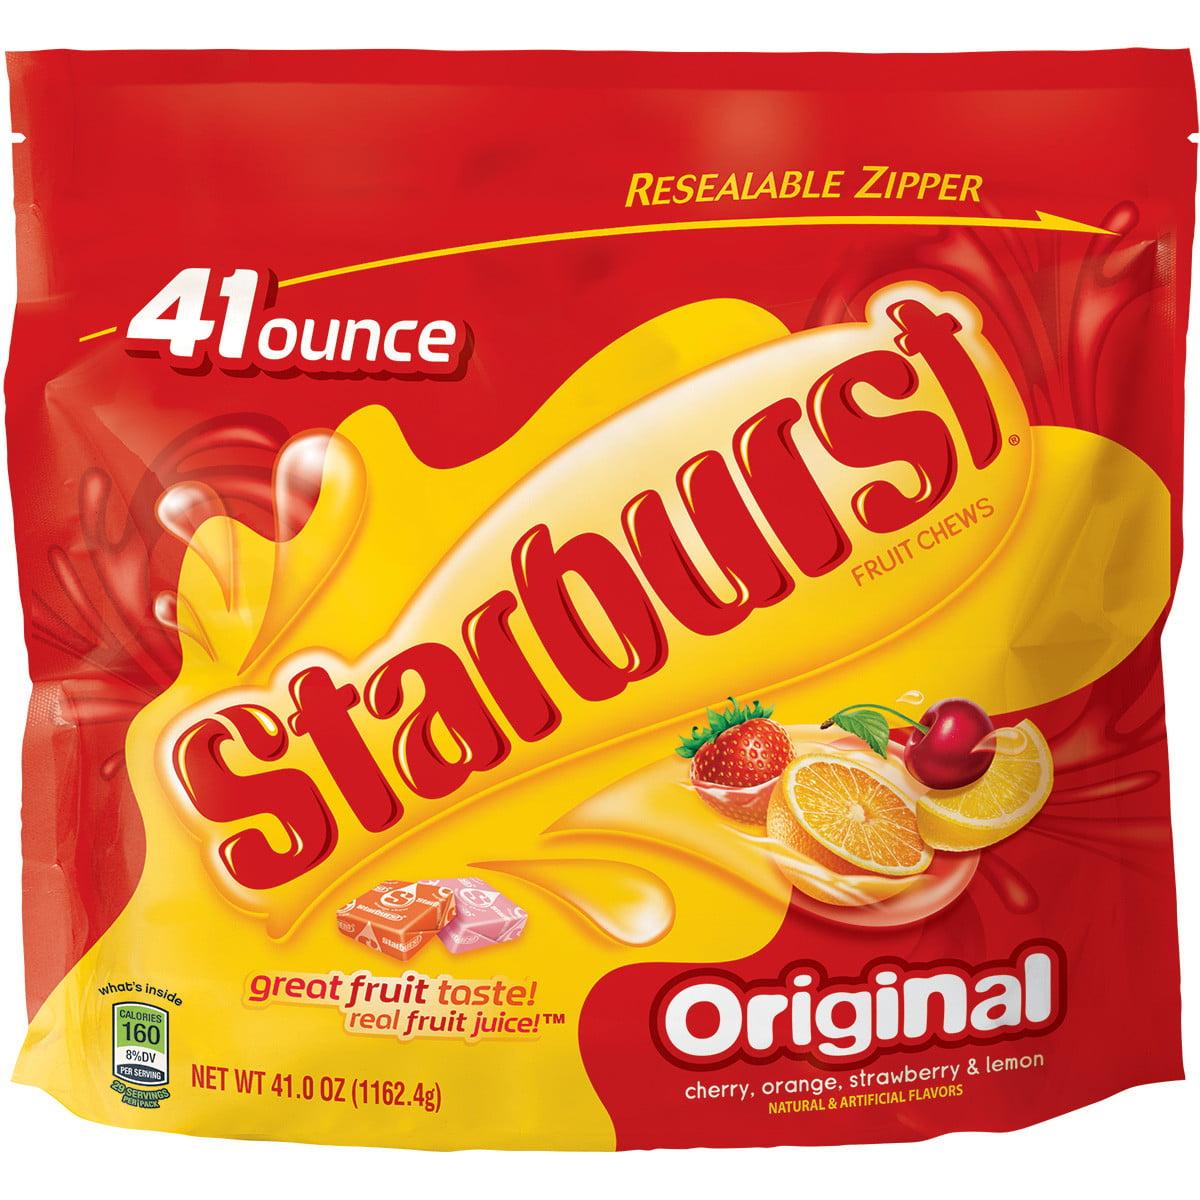 Starburst Original Fruit Chews Candy Bag, 41 ounce